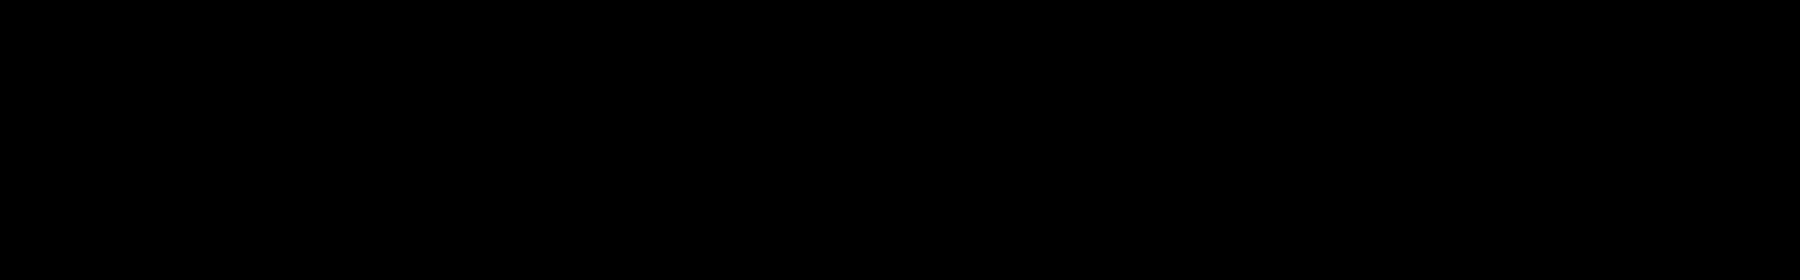 Stratosphere by Elliot Berger audio waveform